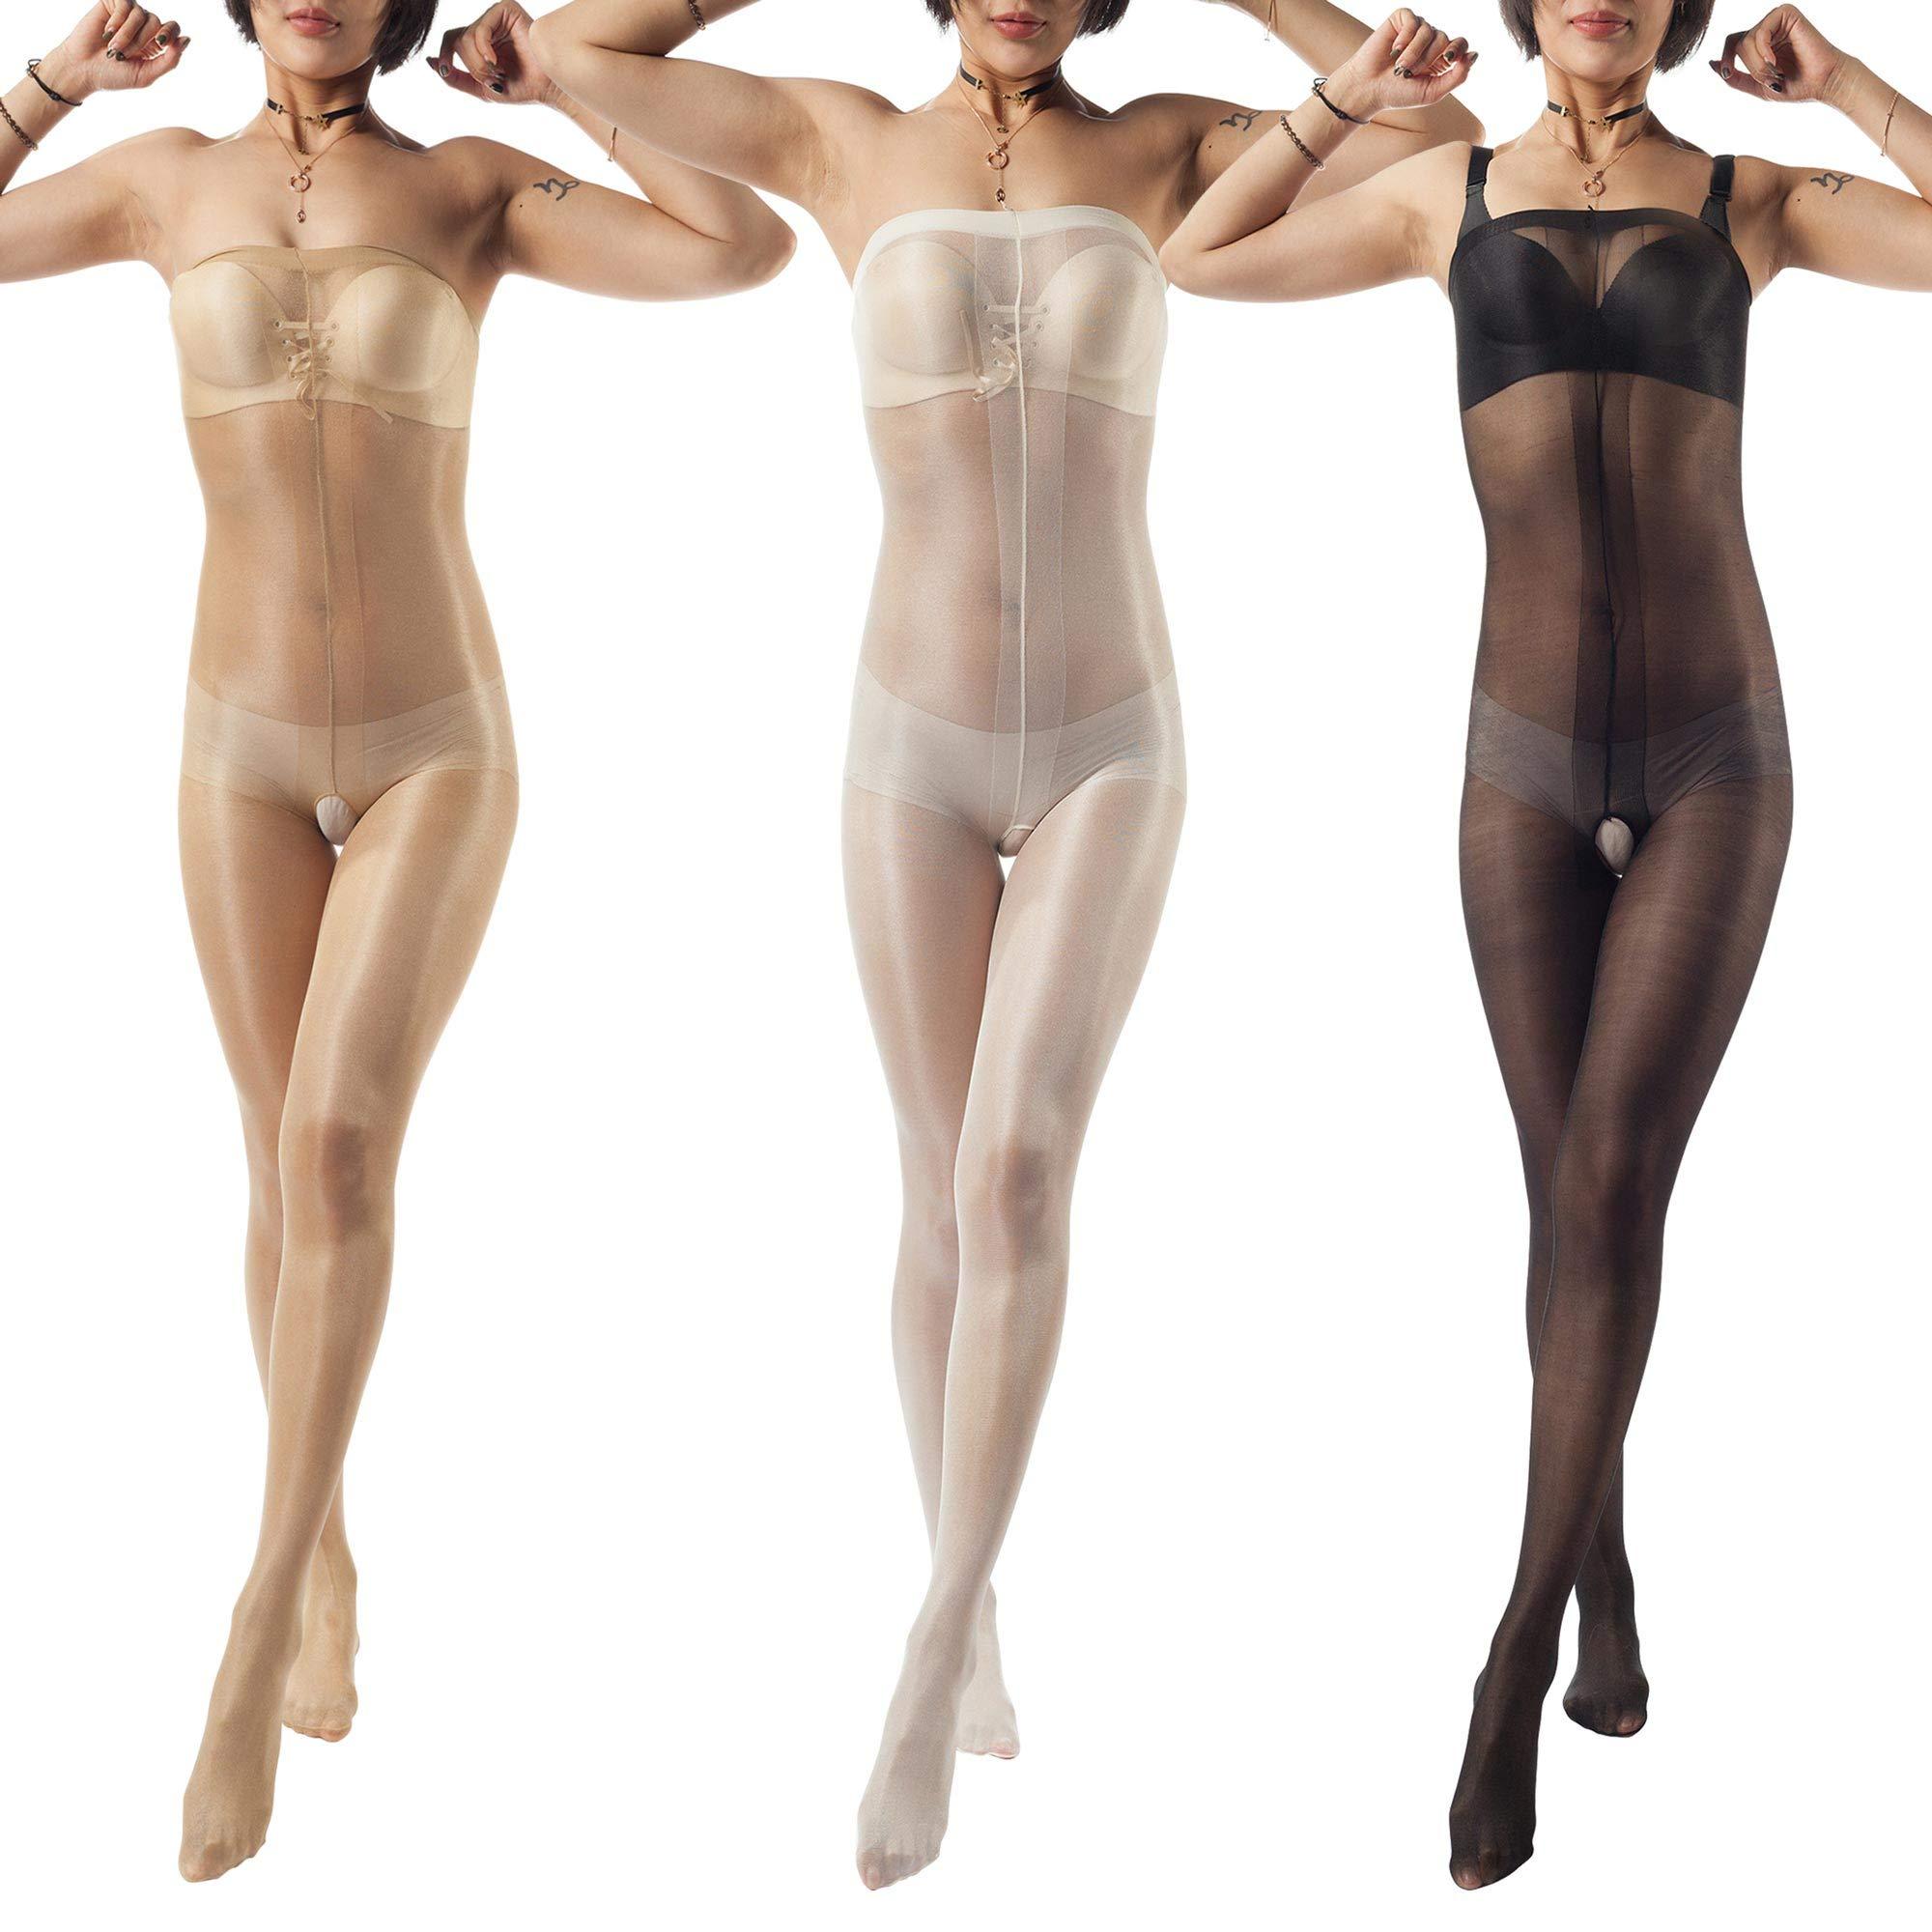 ElsaYX Women's Shiny Toe to Bust Body Stocking Pantyhose Nightwear 3 Pairs - Beige/White/Black One size:Height 4'9''-5'7''